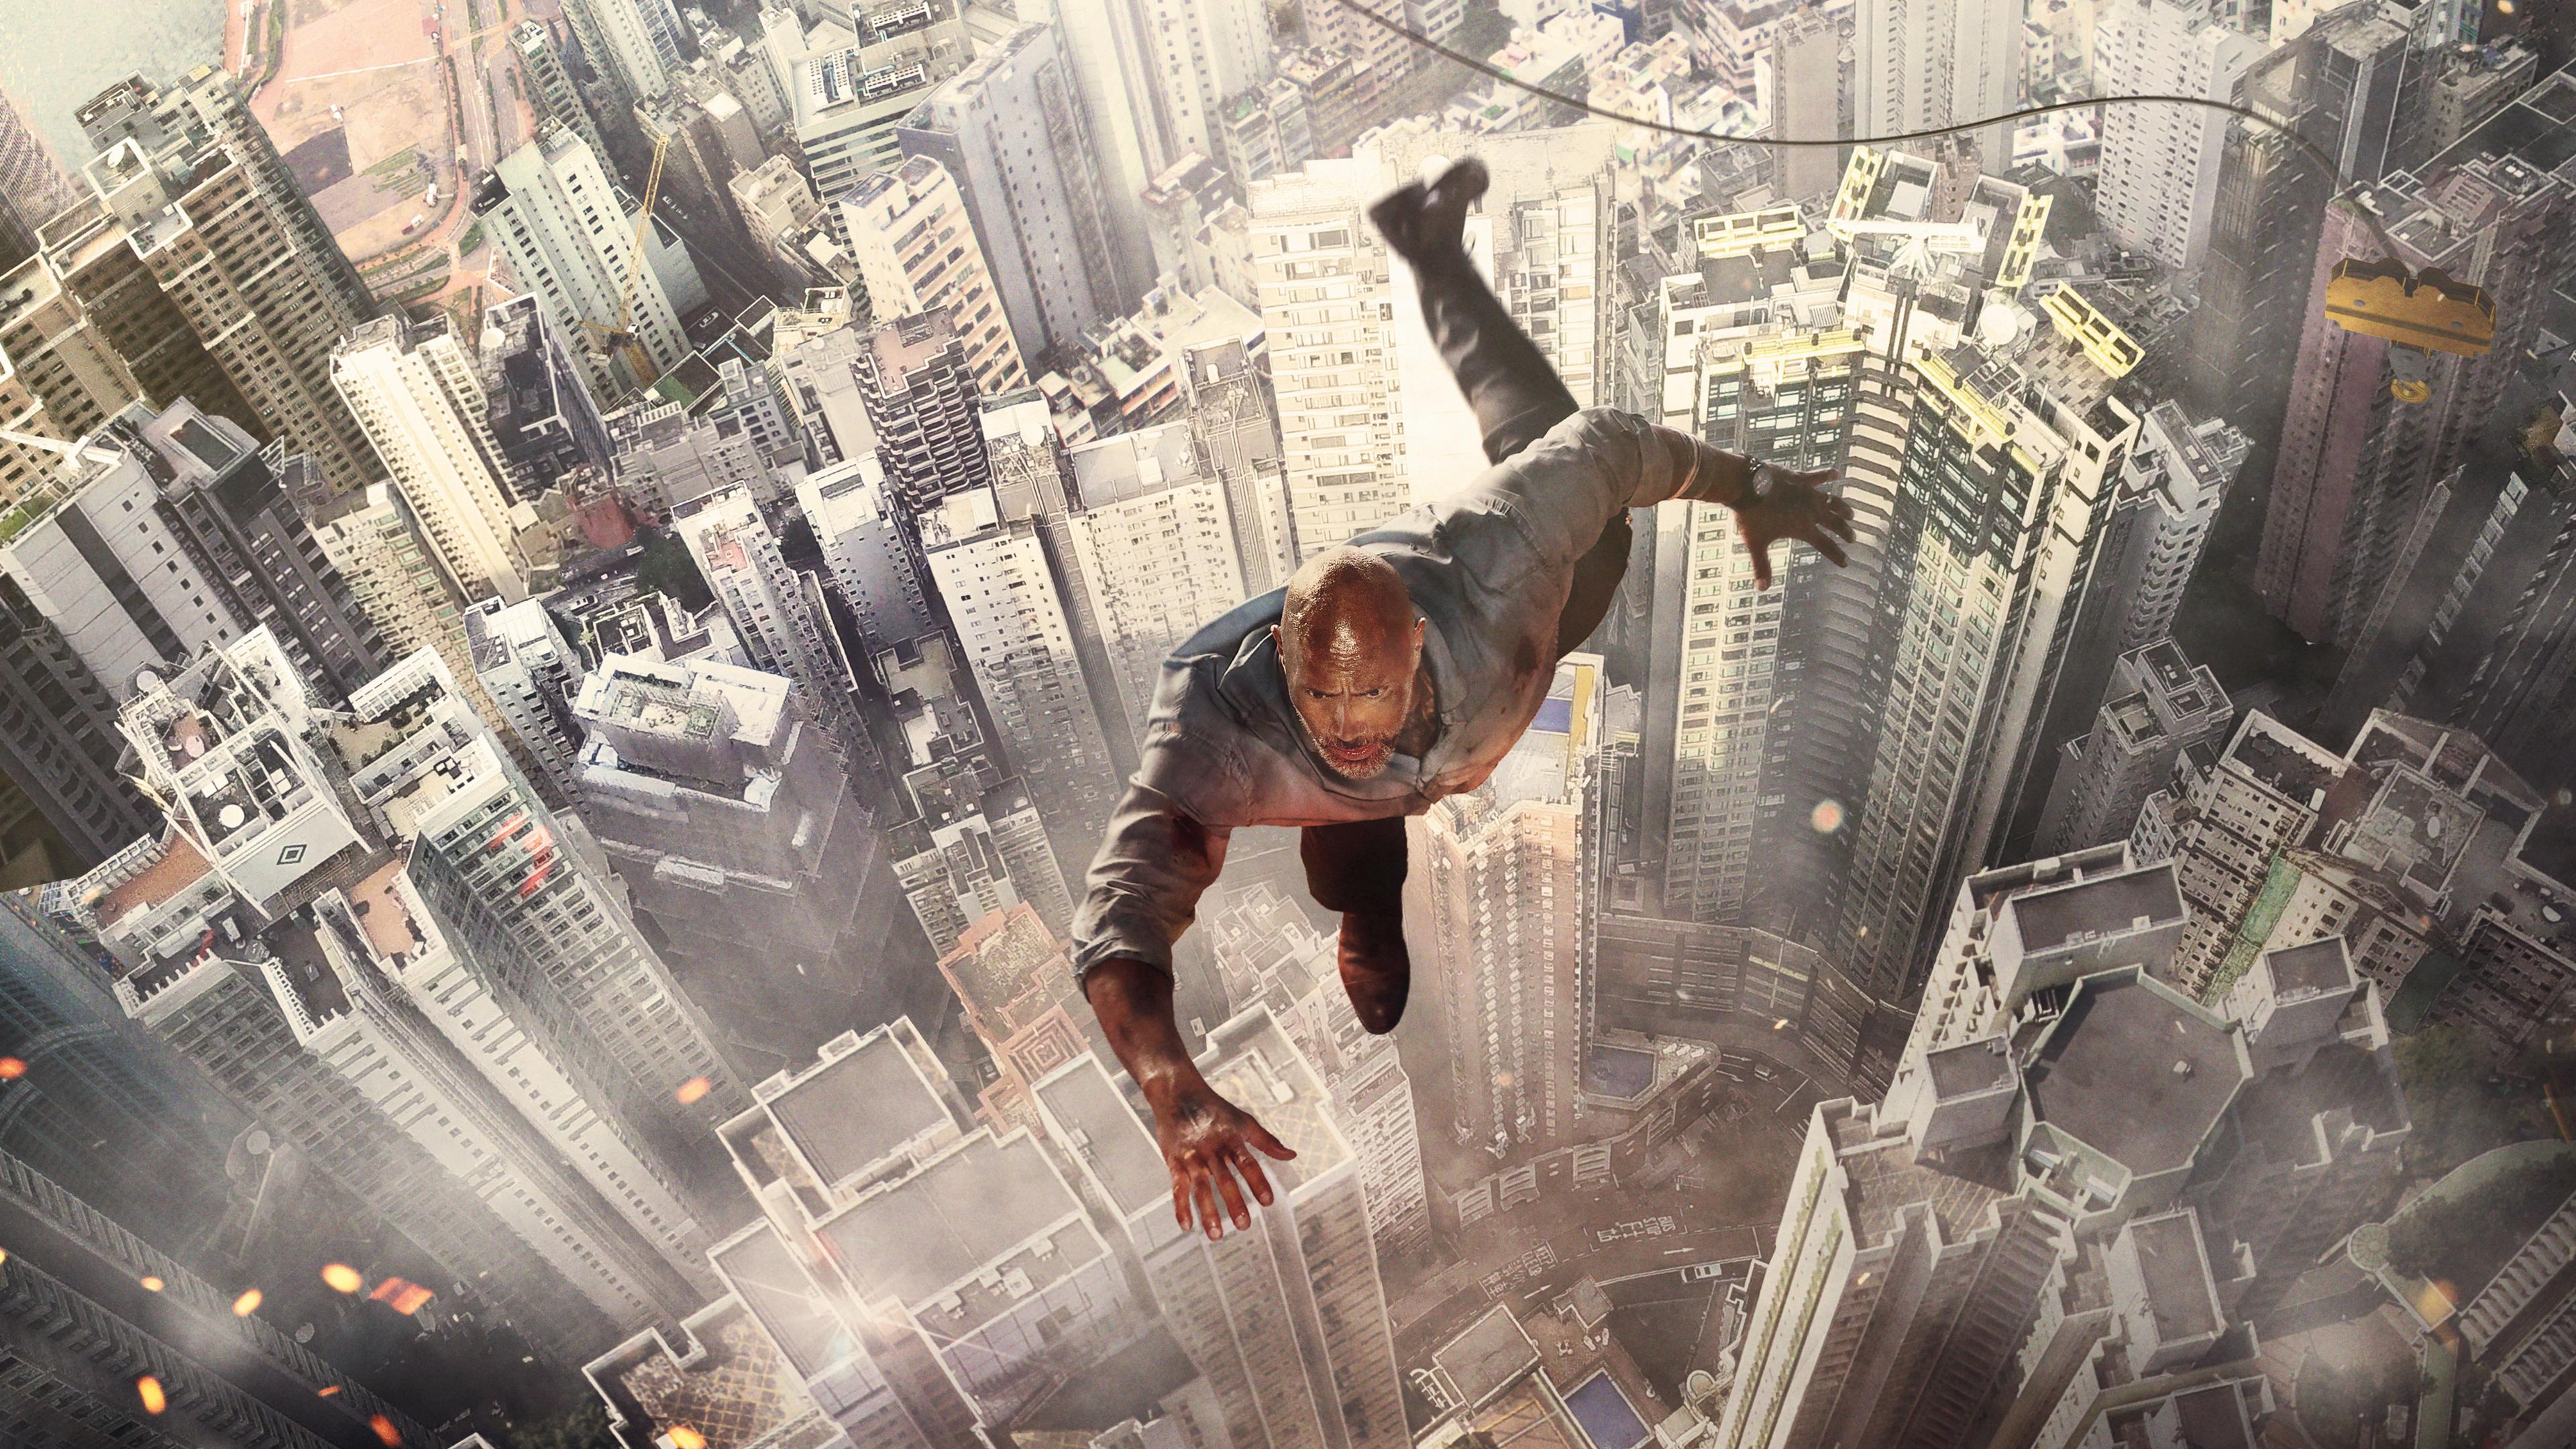 dwayne johnson jumping buildings 4k 1537645004 - Dwayne Johnson Jumping Buildings 4k - skyscraper movie wallpapers, movies wallpapers, hd-wallpapers, dwayne johnson wallpapers, 4k-wallpapers, 2018-movies-wallpapers